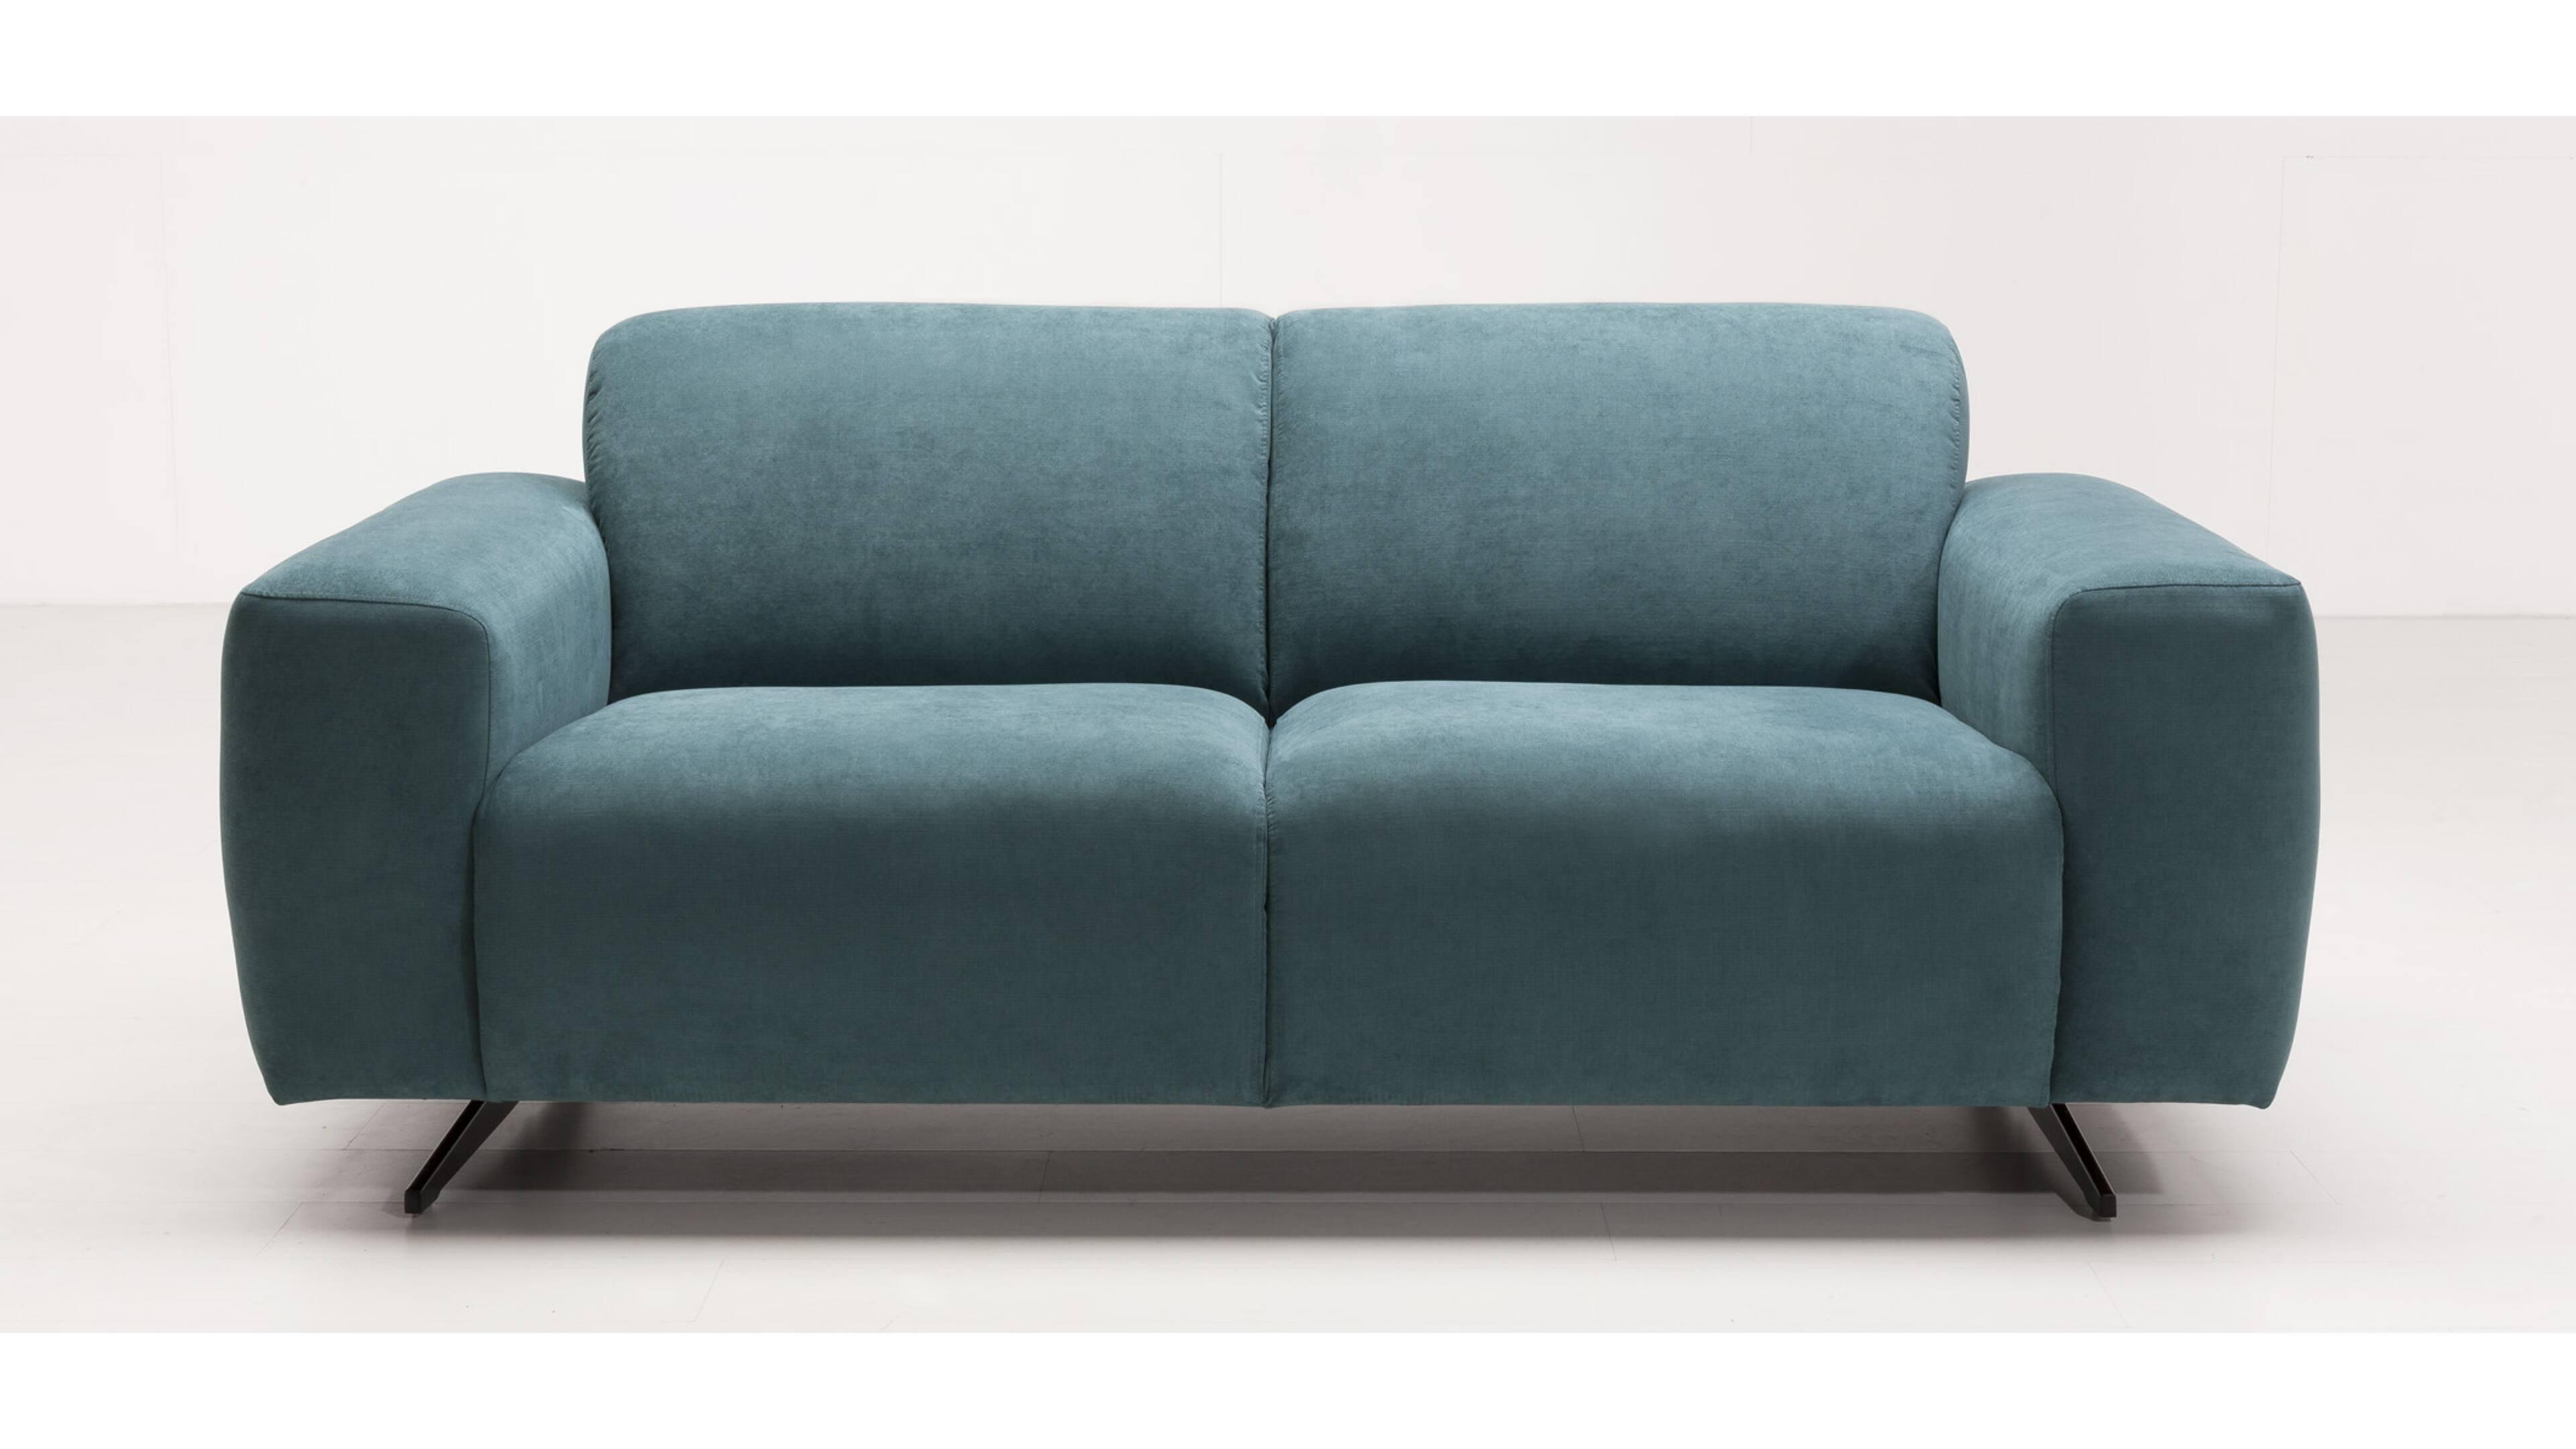 3-Sitzer Matrix 12 Grün Oceanfarbener Bezug Matrix 12 & Metallfüße